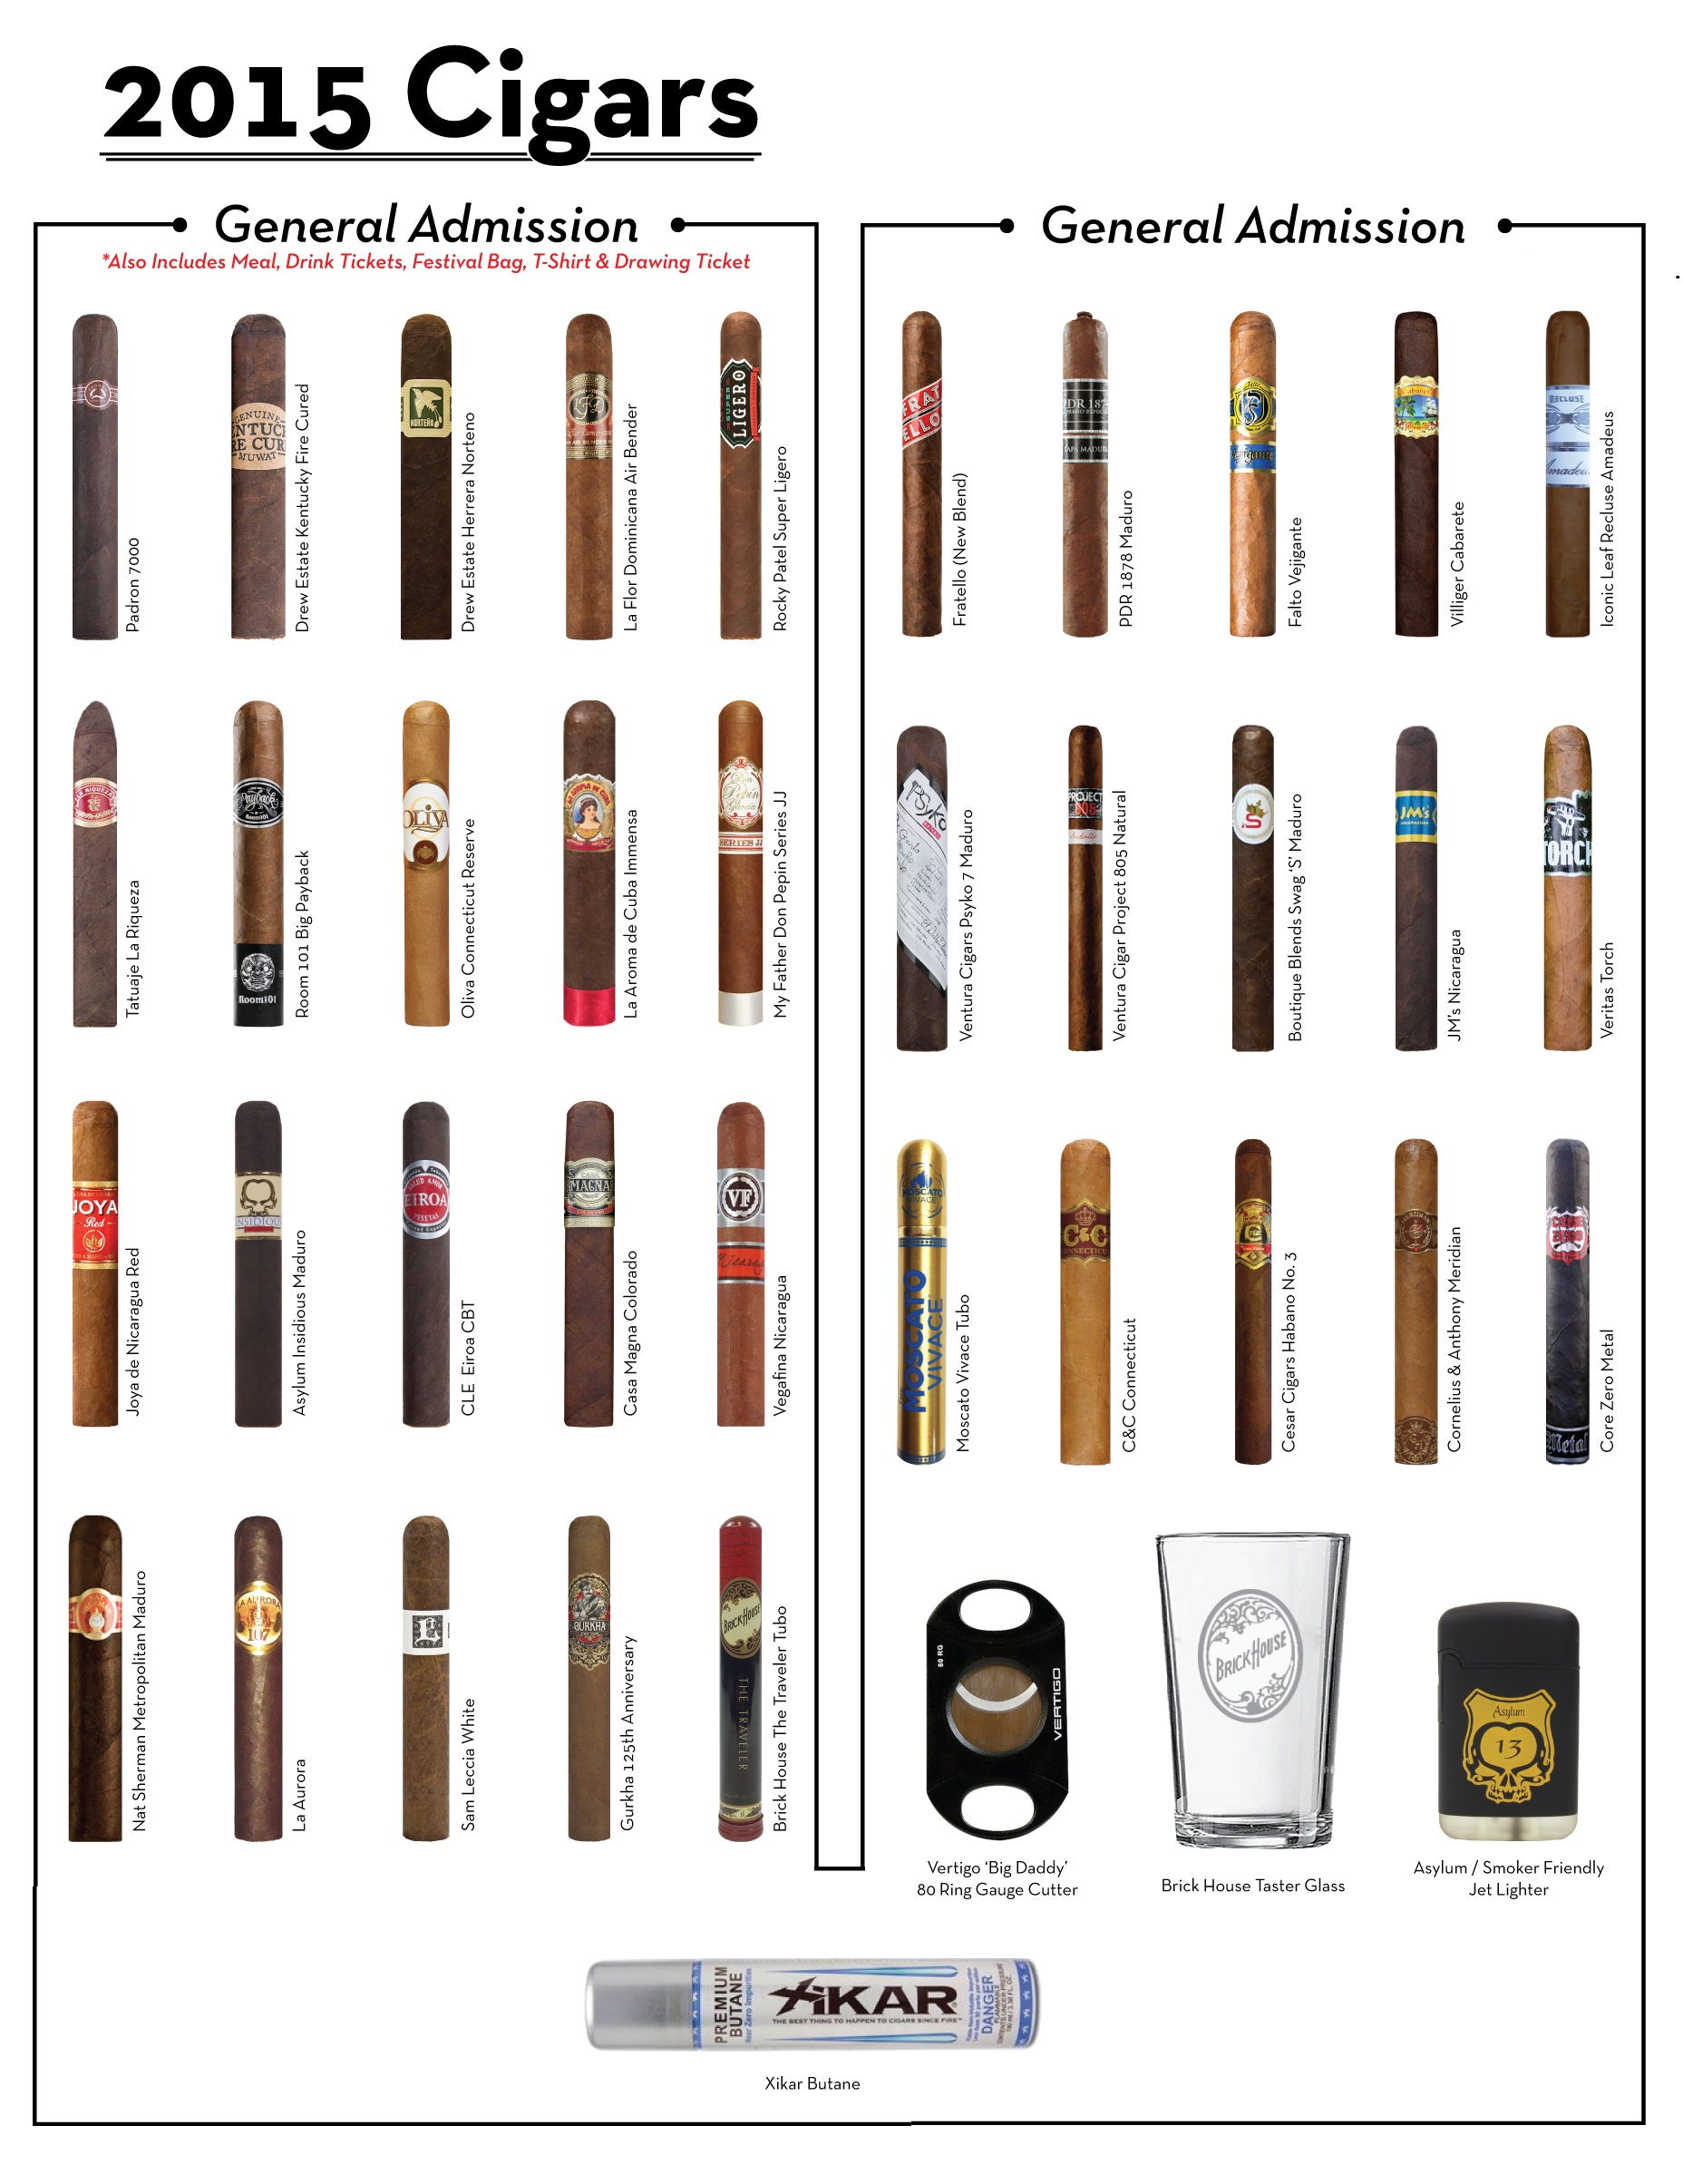 2015 Cigars